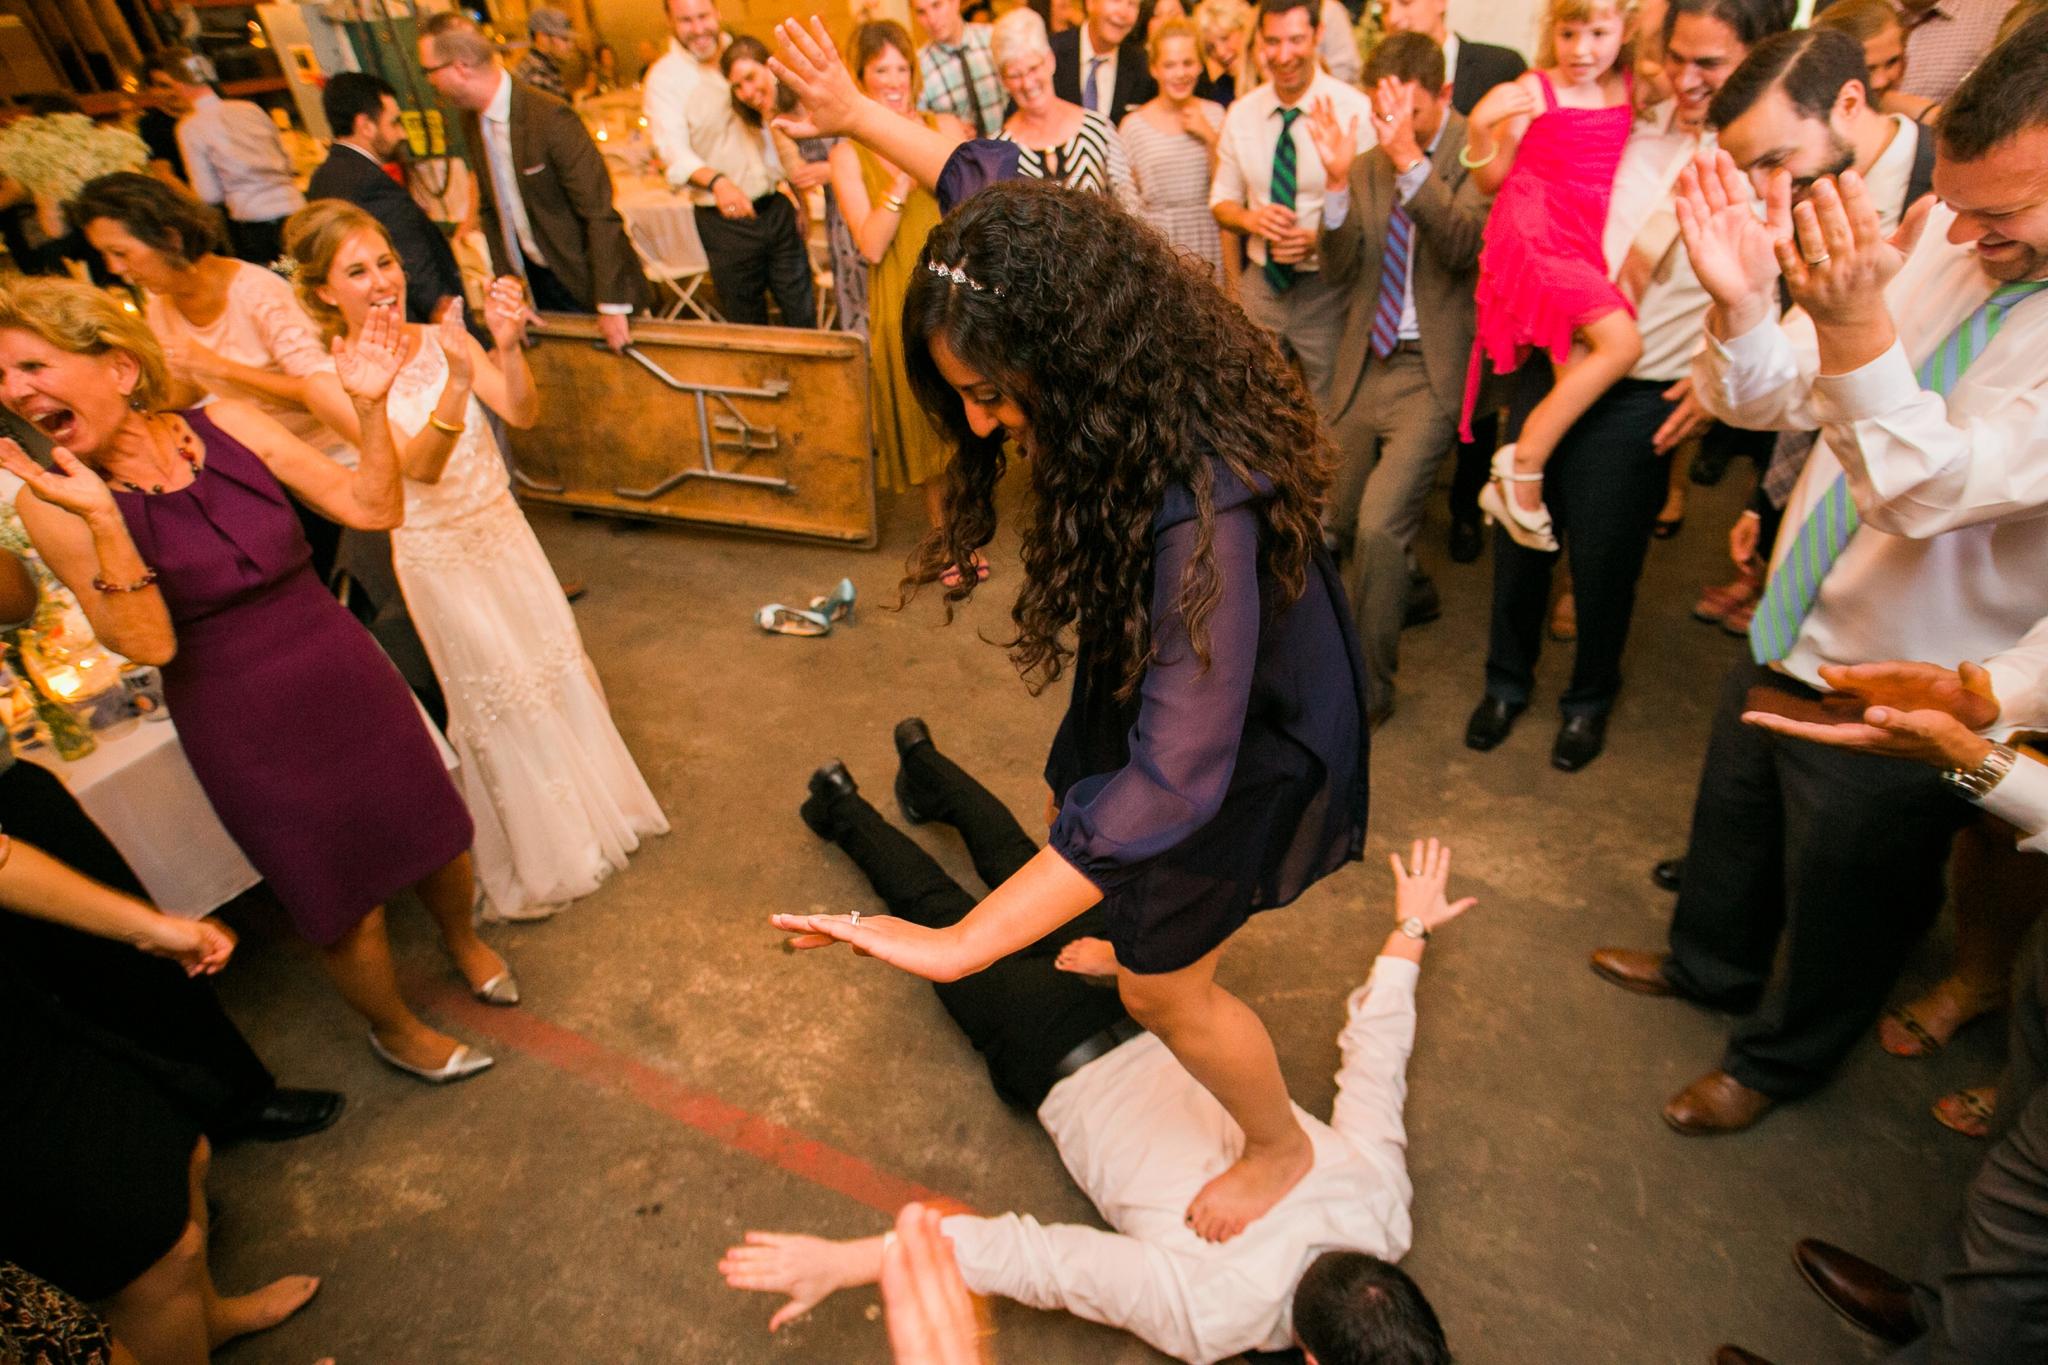 West-Supply-Foundry-Chicago-Wedding-186.jpg